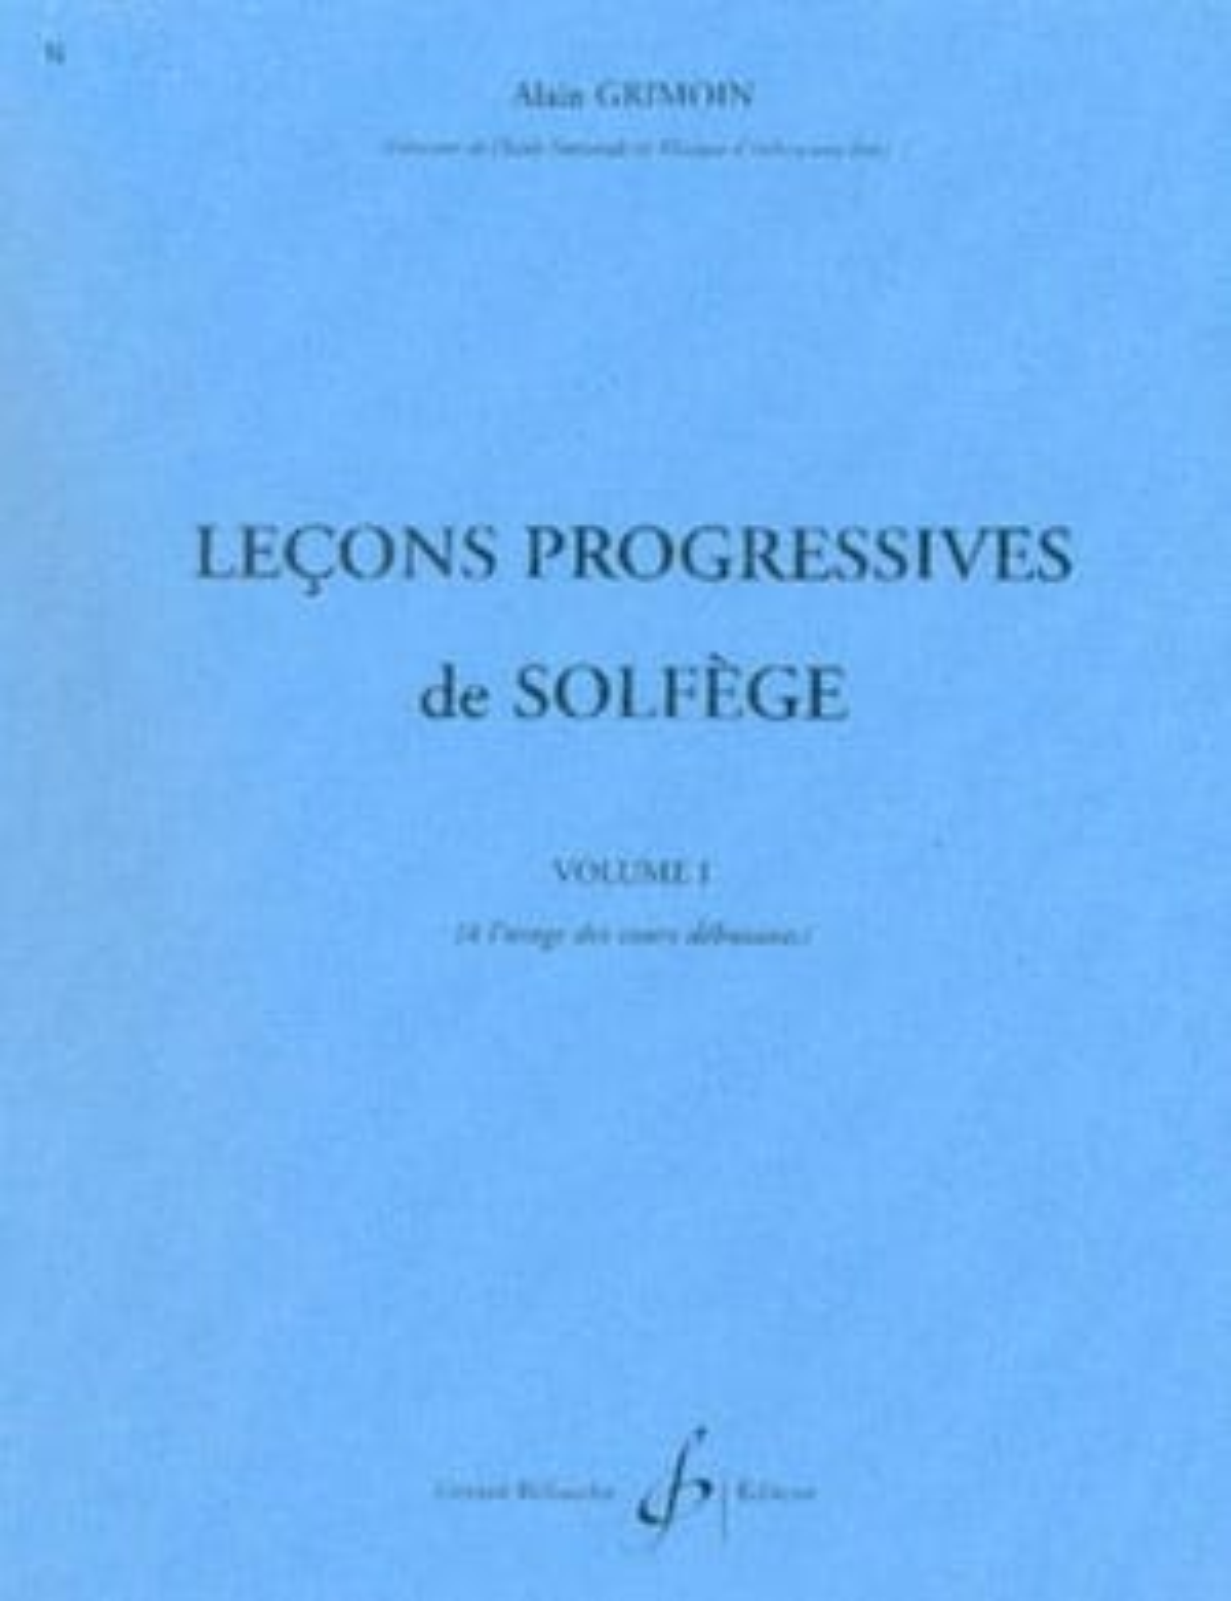 30 Leçons Progressives Volume 1 - Alain Grimoin - laflutedepan.com